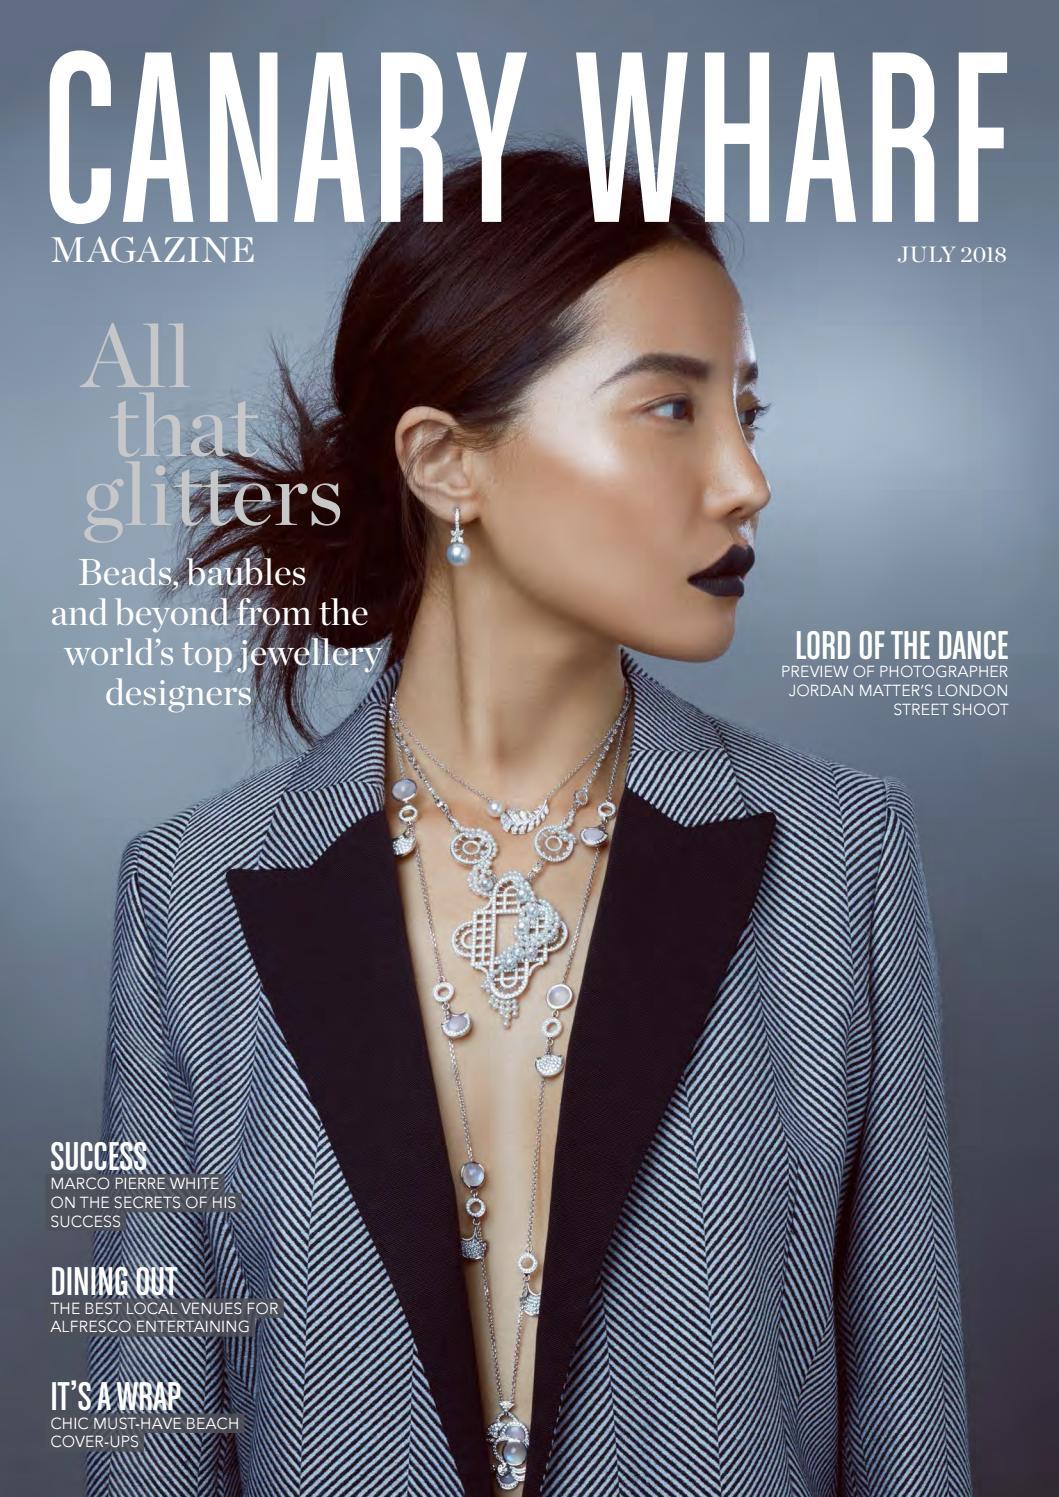 dbed095f0d60 Canary Wharf Magazine July 2018 by Luxury London Media - issuu